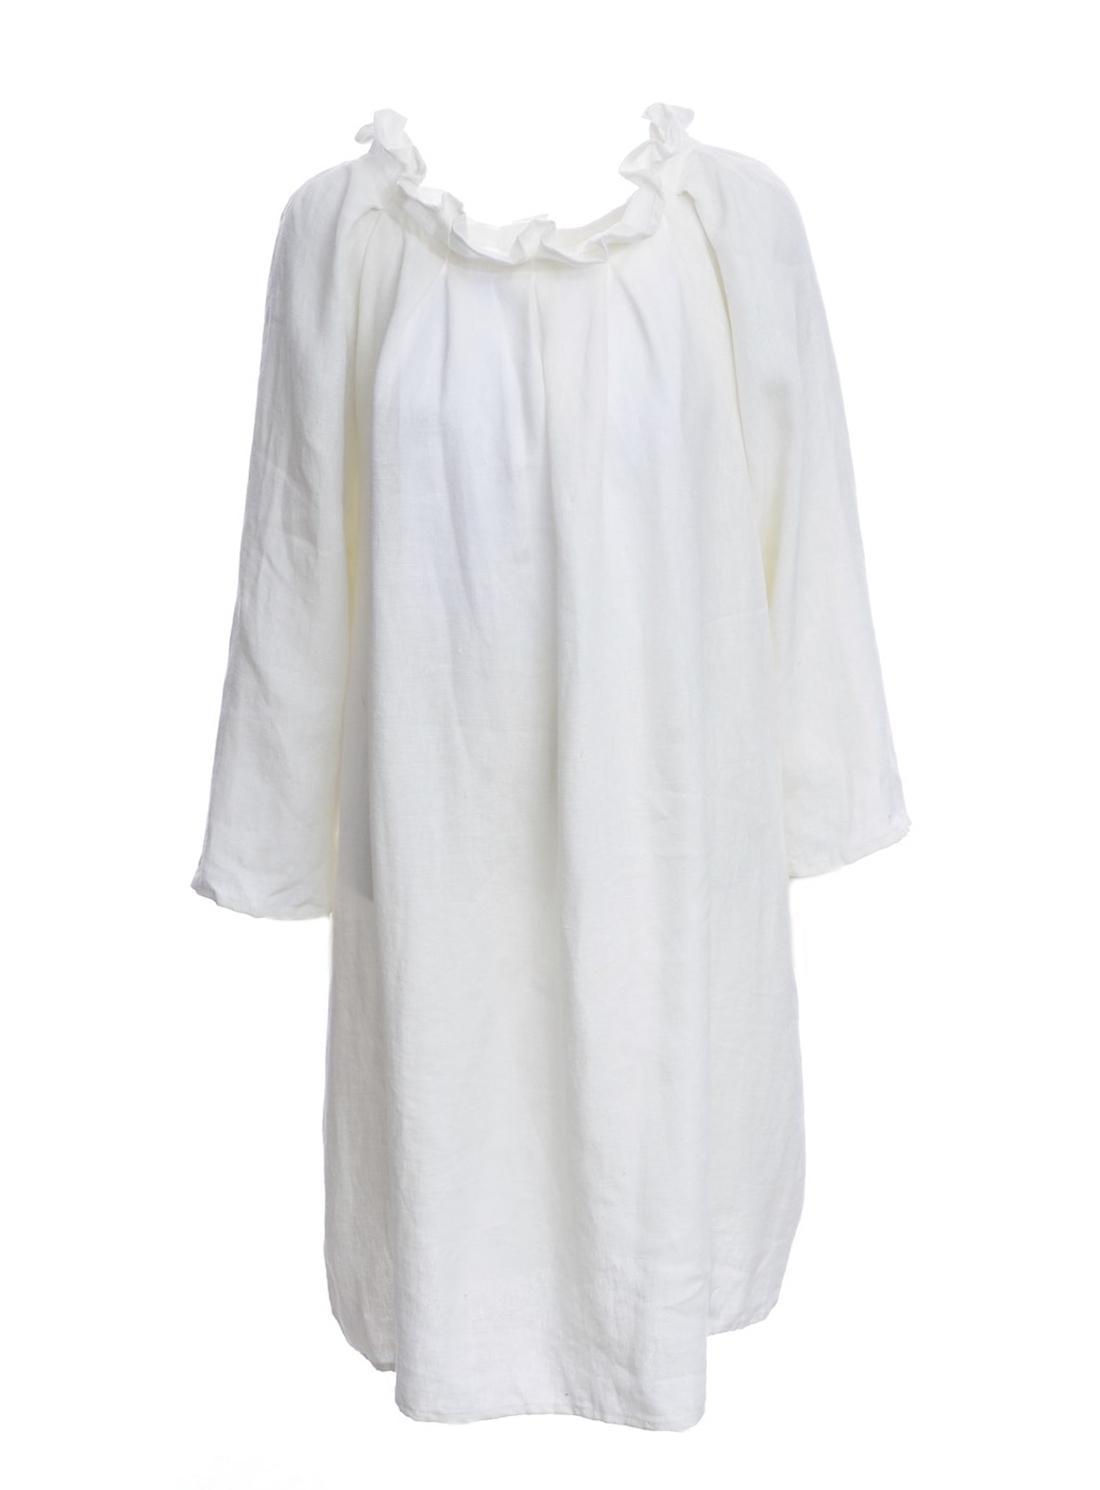 NWT ATHLETA $128 Reversible Santorini Dress Silver Bells//Grey sz M